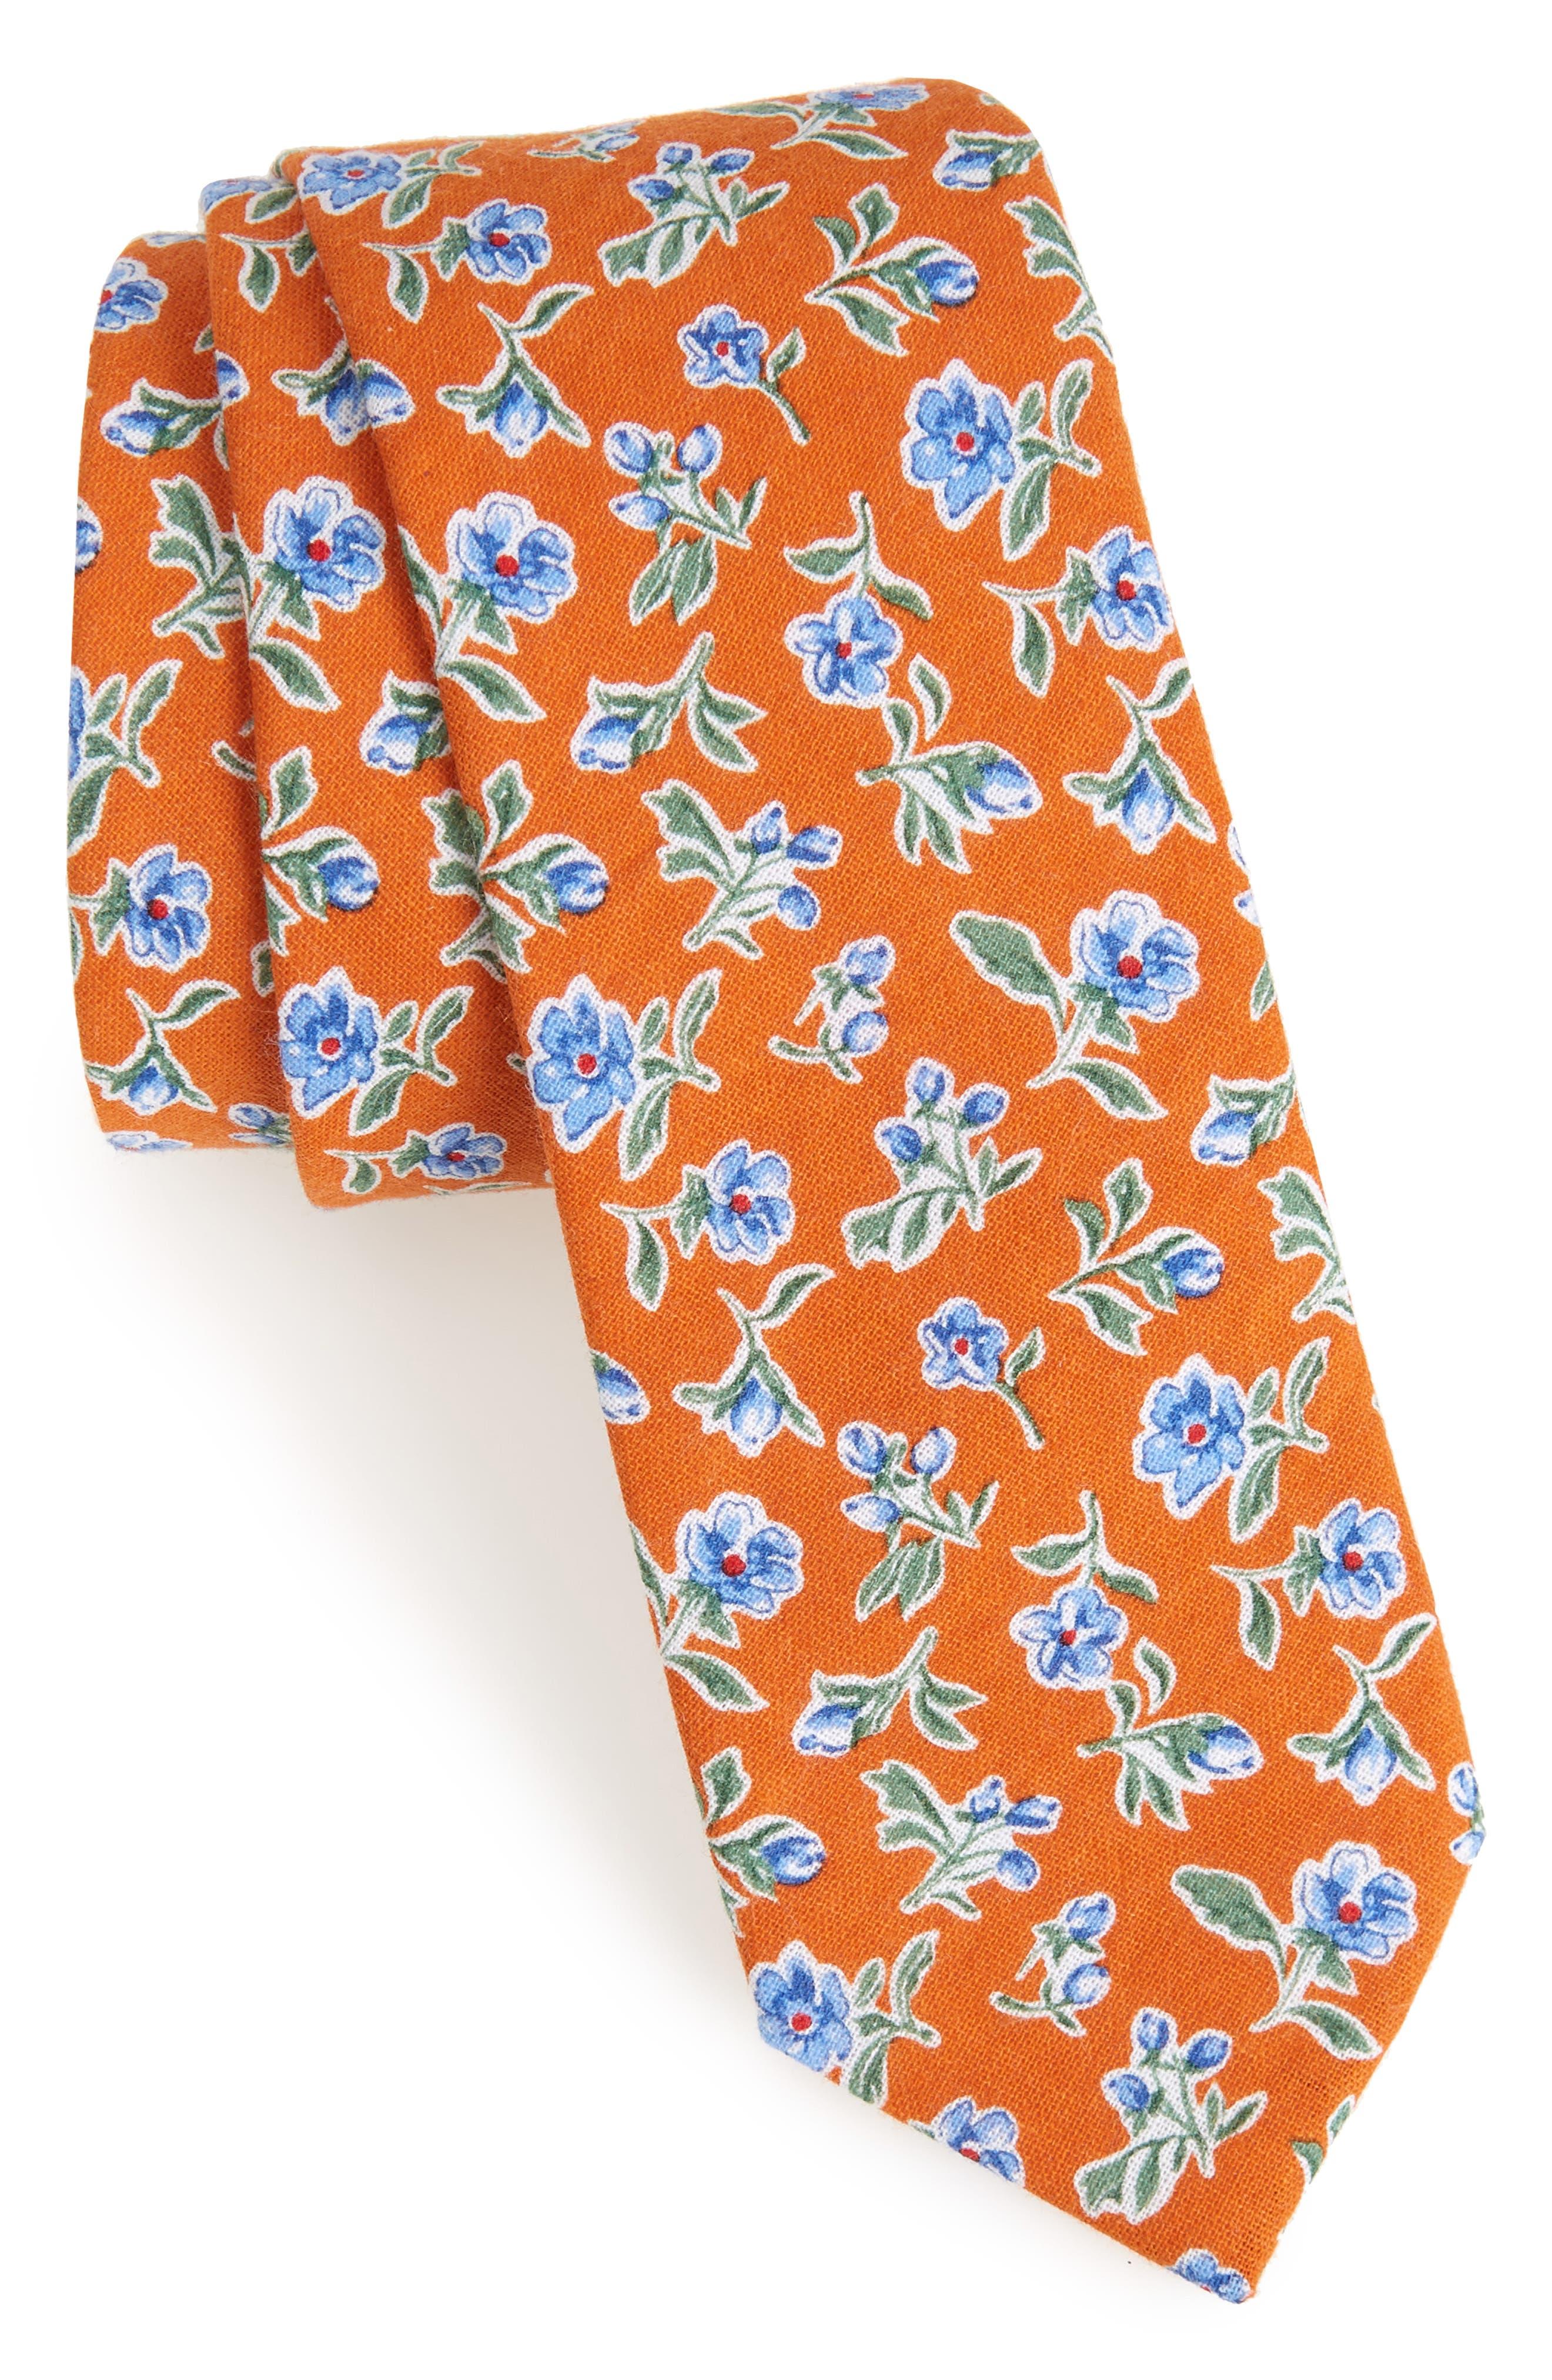 Main Image - Nordstrom Men's Shop Kendals Floral Cotton Skinny Tie